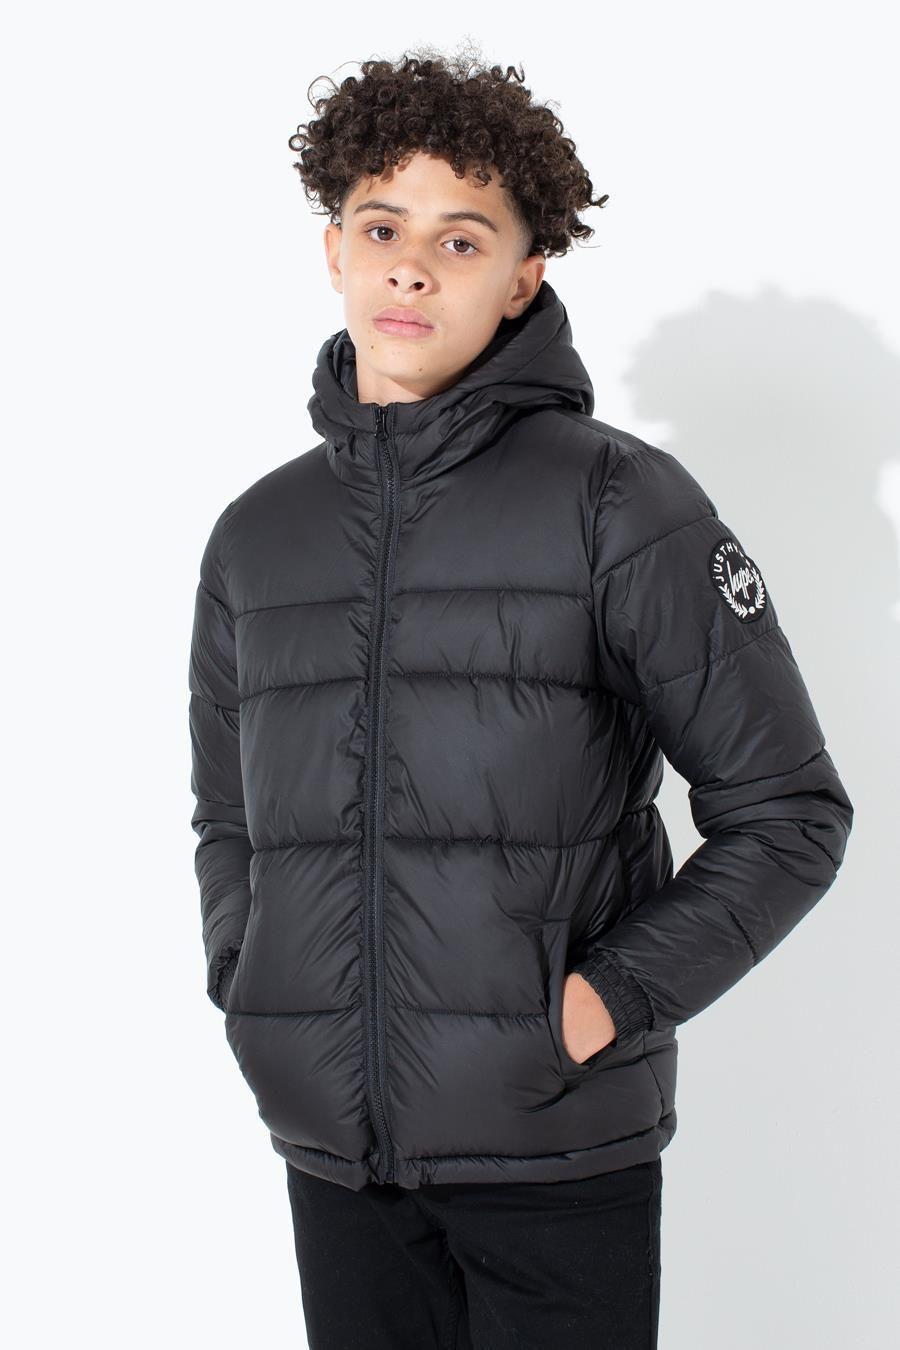 Hype Crest Sleeve Kids Puffer Jacket